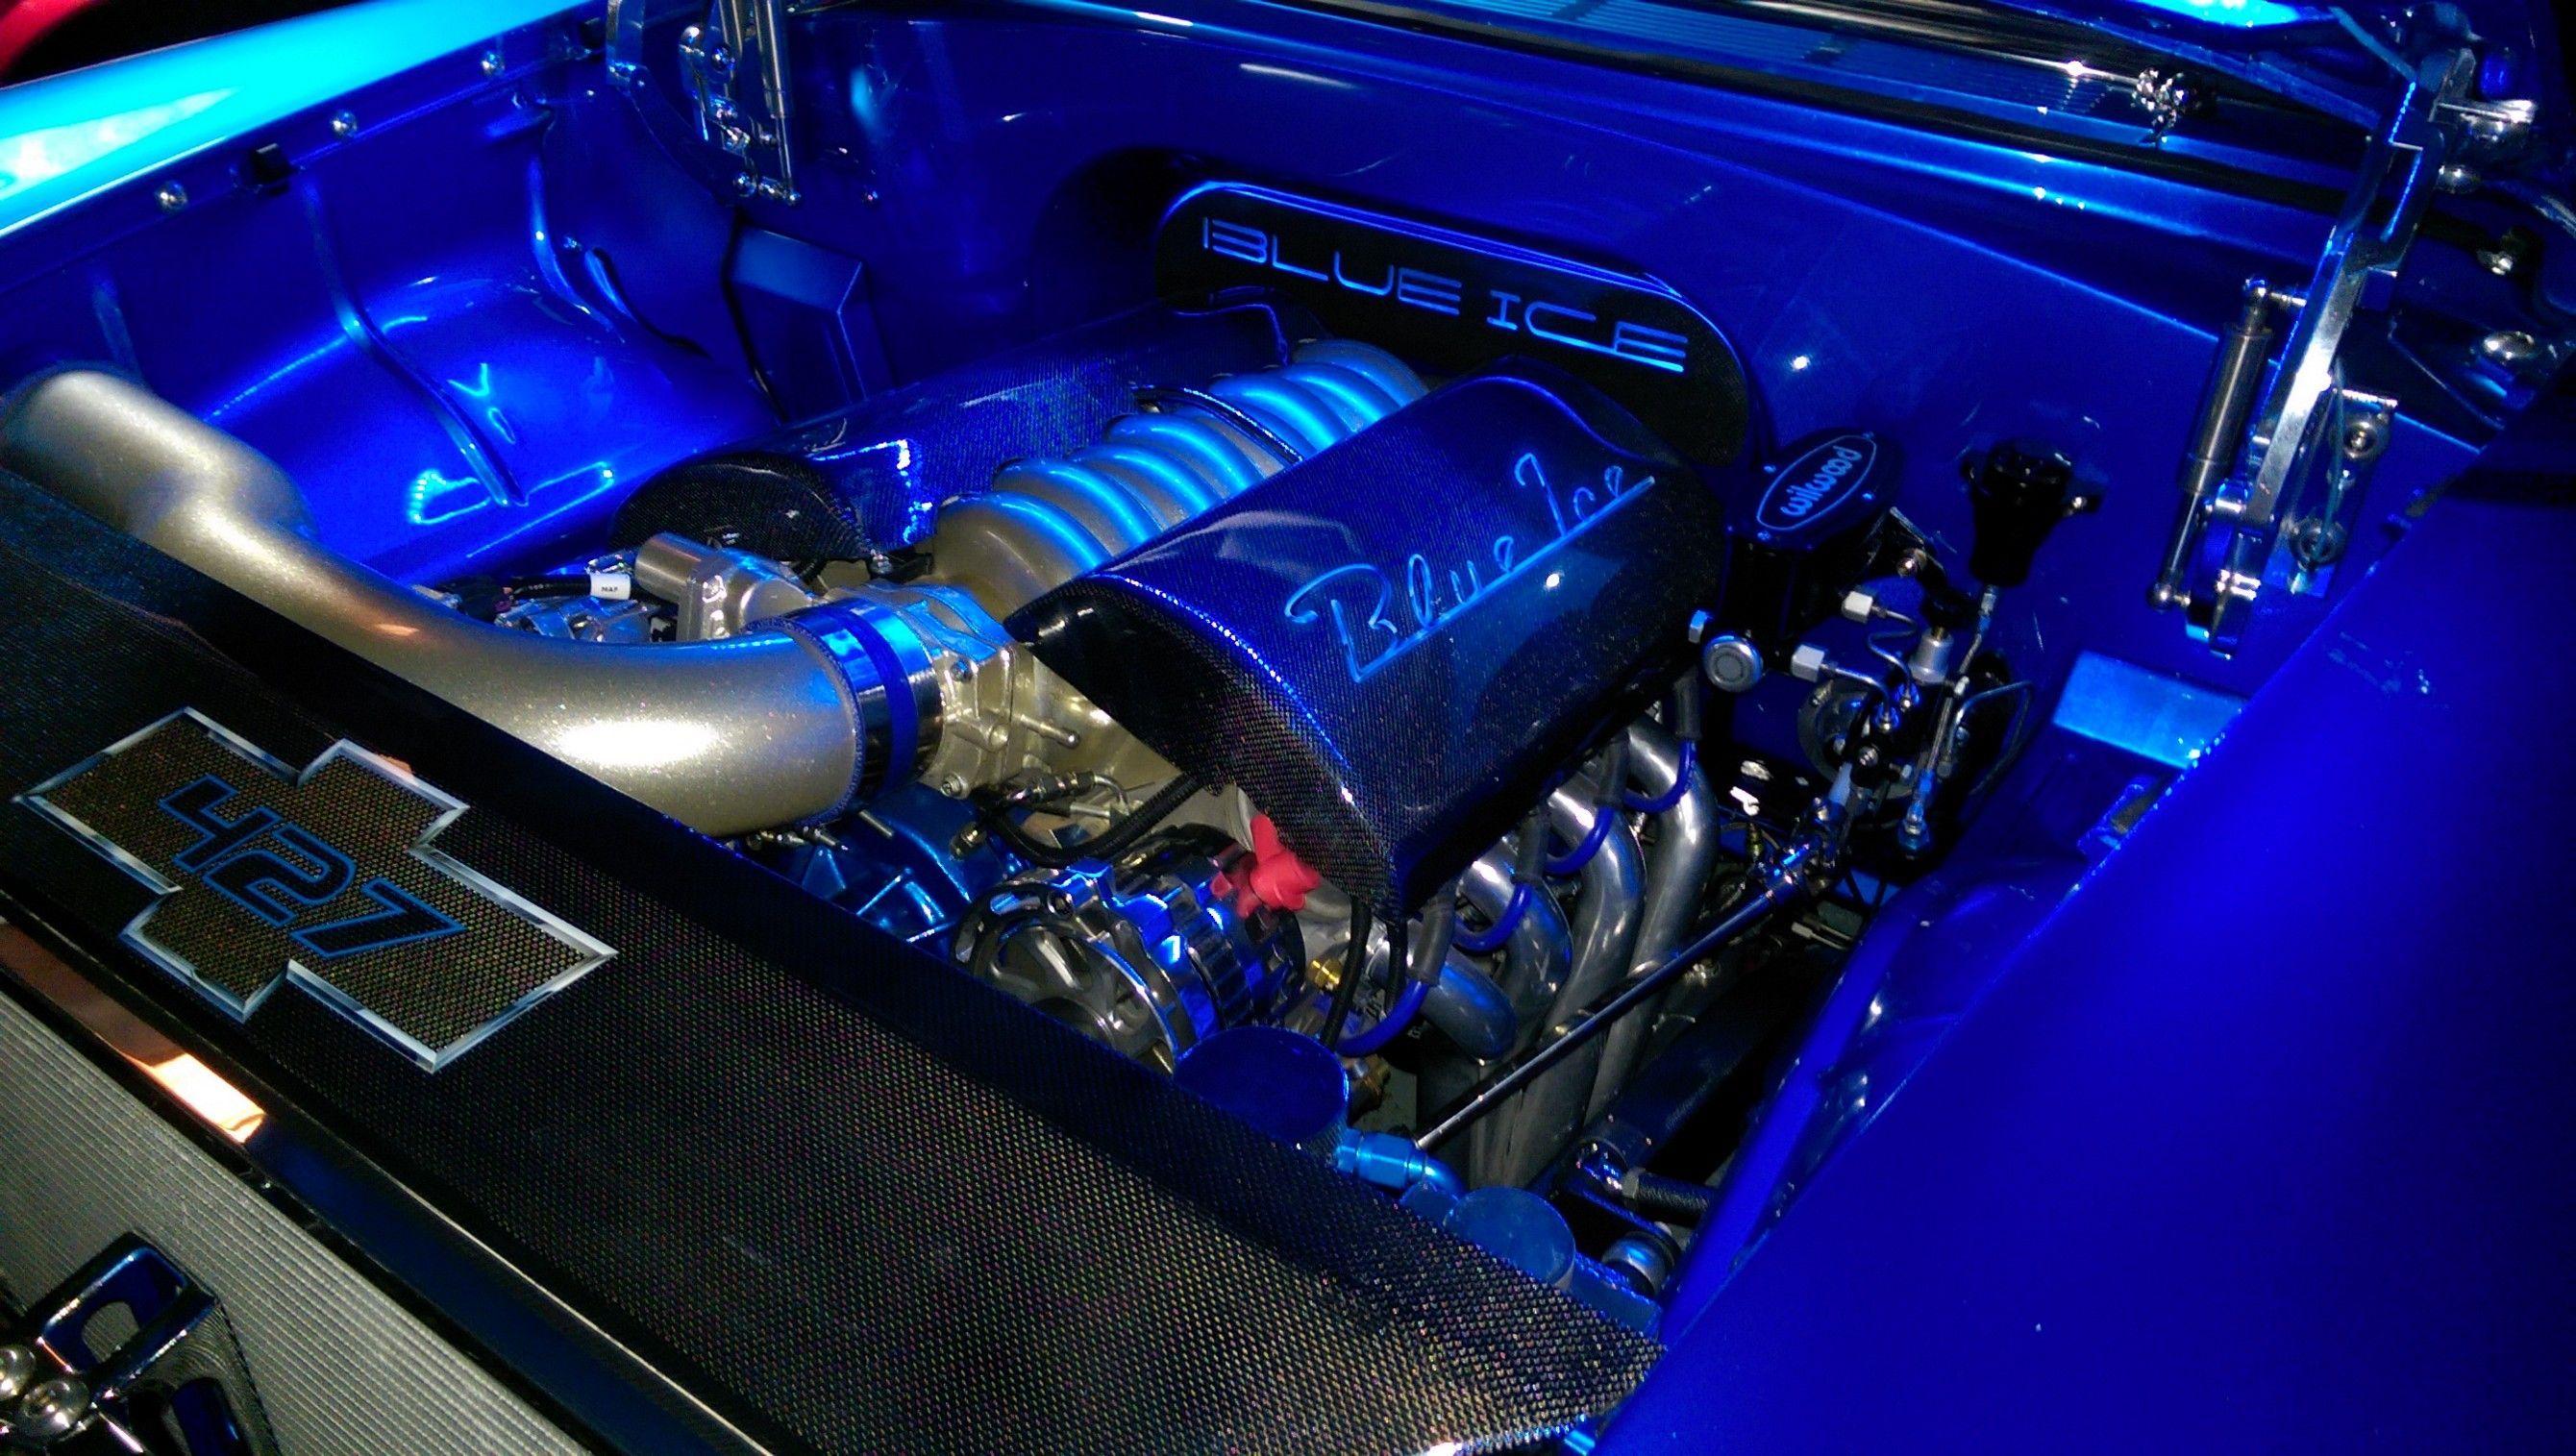 BluePrint PSLS4272CTF GM 427 LS Engine Dressed Fuel Injected